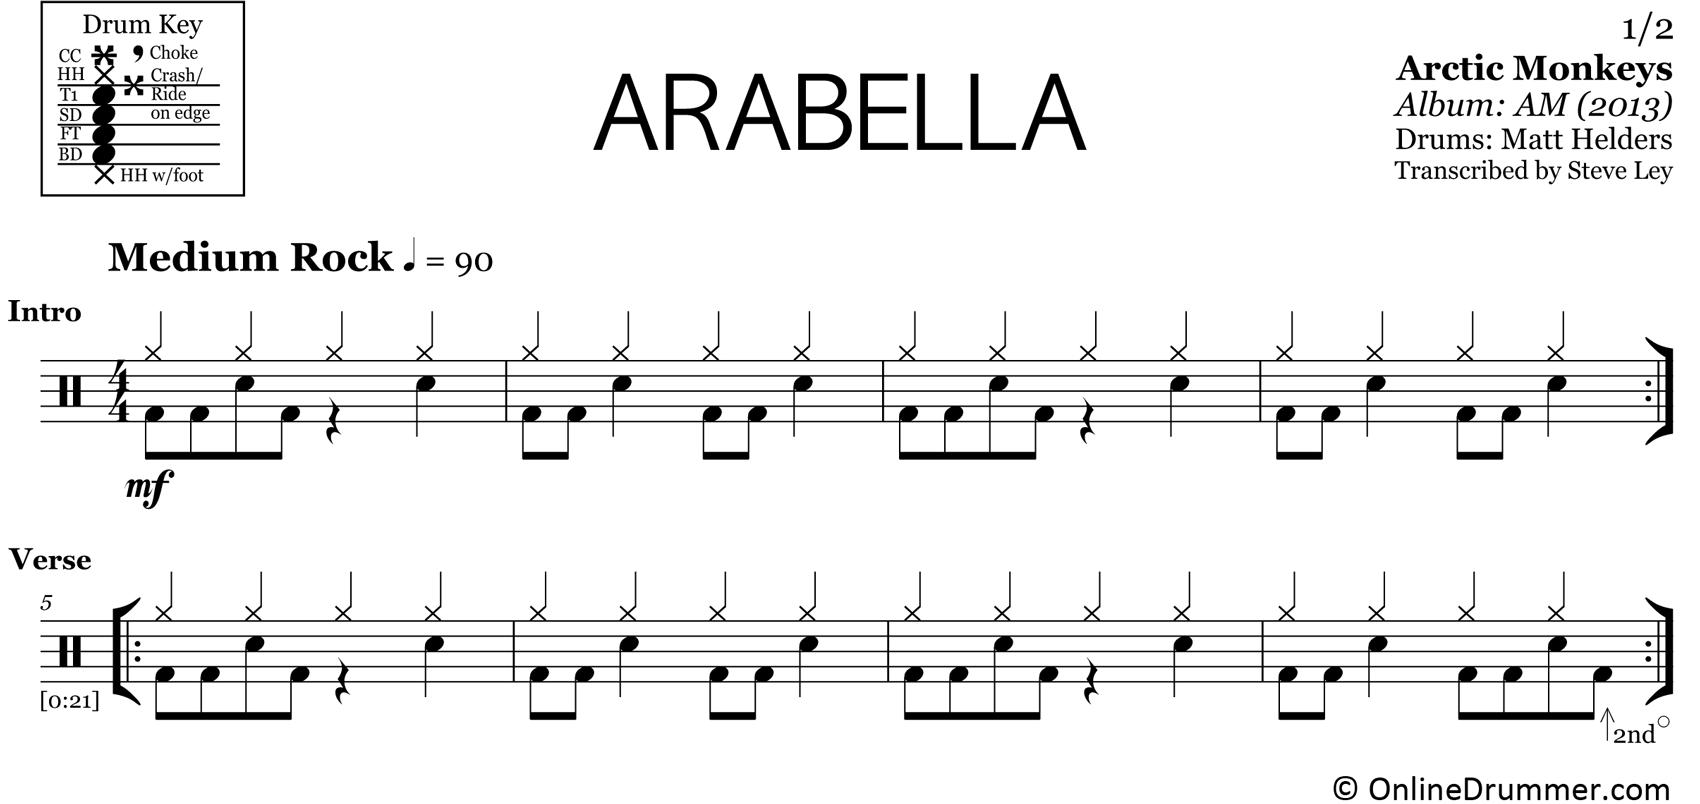 Arabella - Arctic Monkeys - Drum Sheet Music